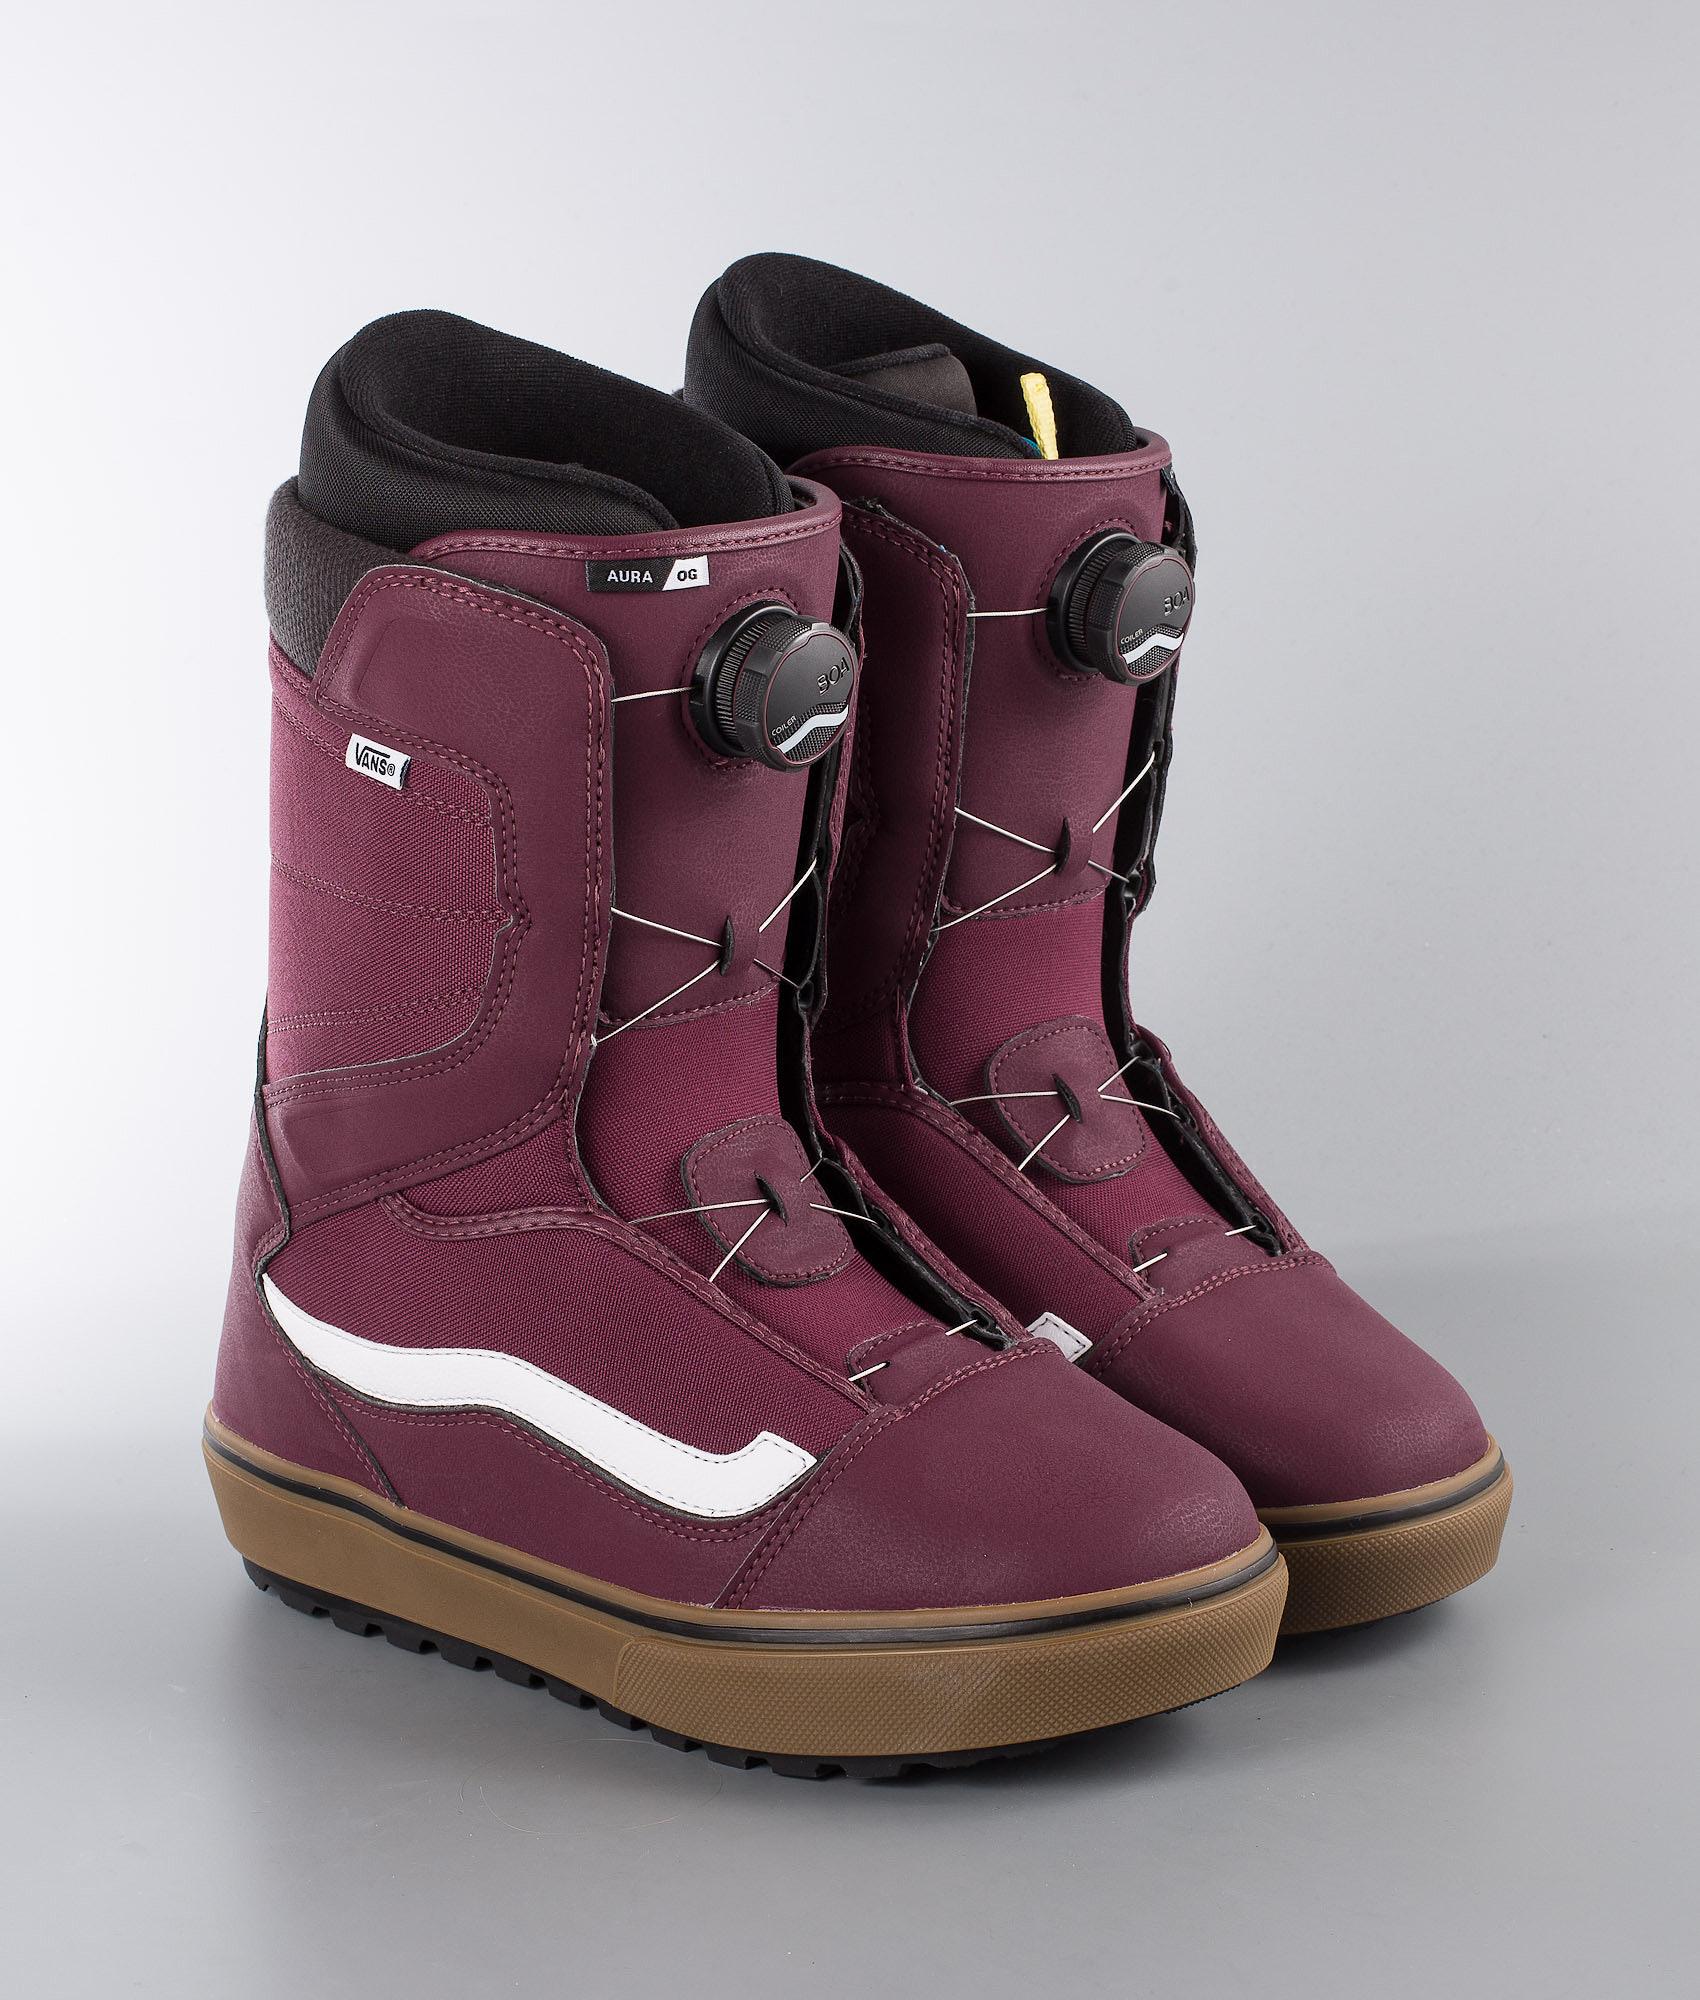 1199fd83bf Vans Aura OG Snowboard Boots Burgundy Gum - Ridestore.com